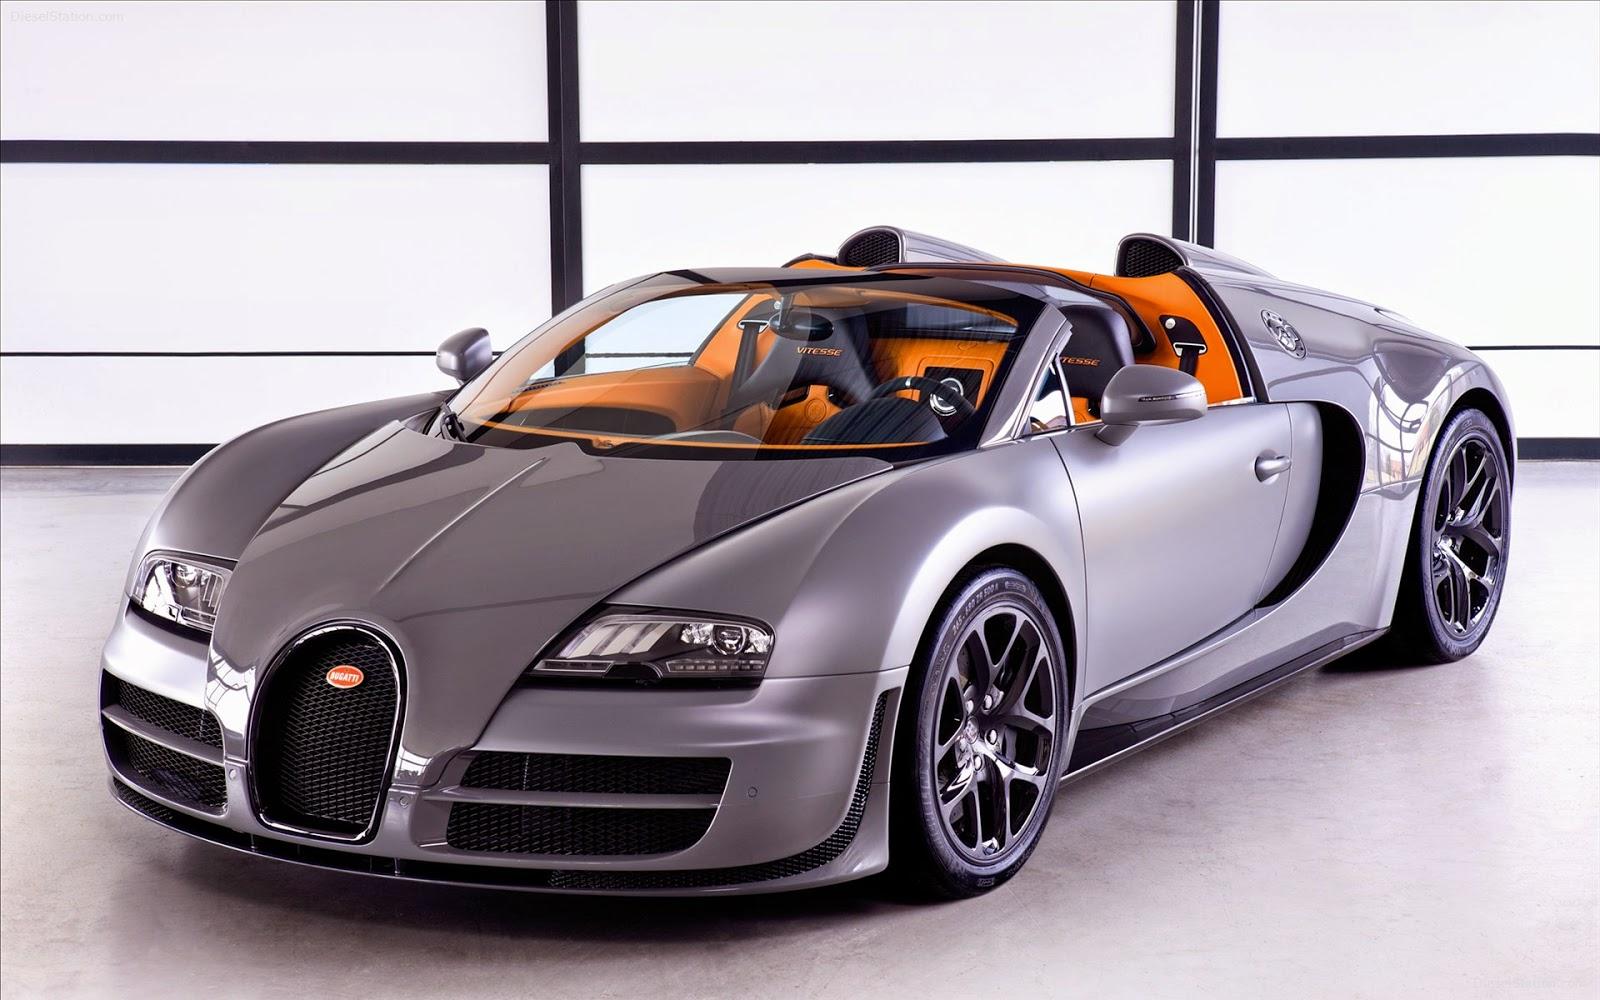 http://www.autocarsinfo.com/2014/12/bugatti-veyron-grand-sport-vitesse-2012.html